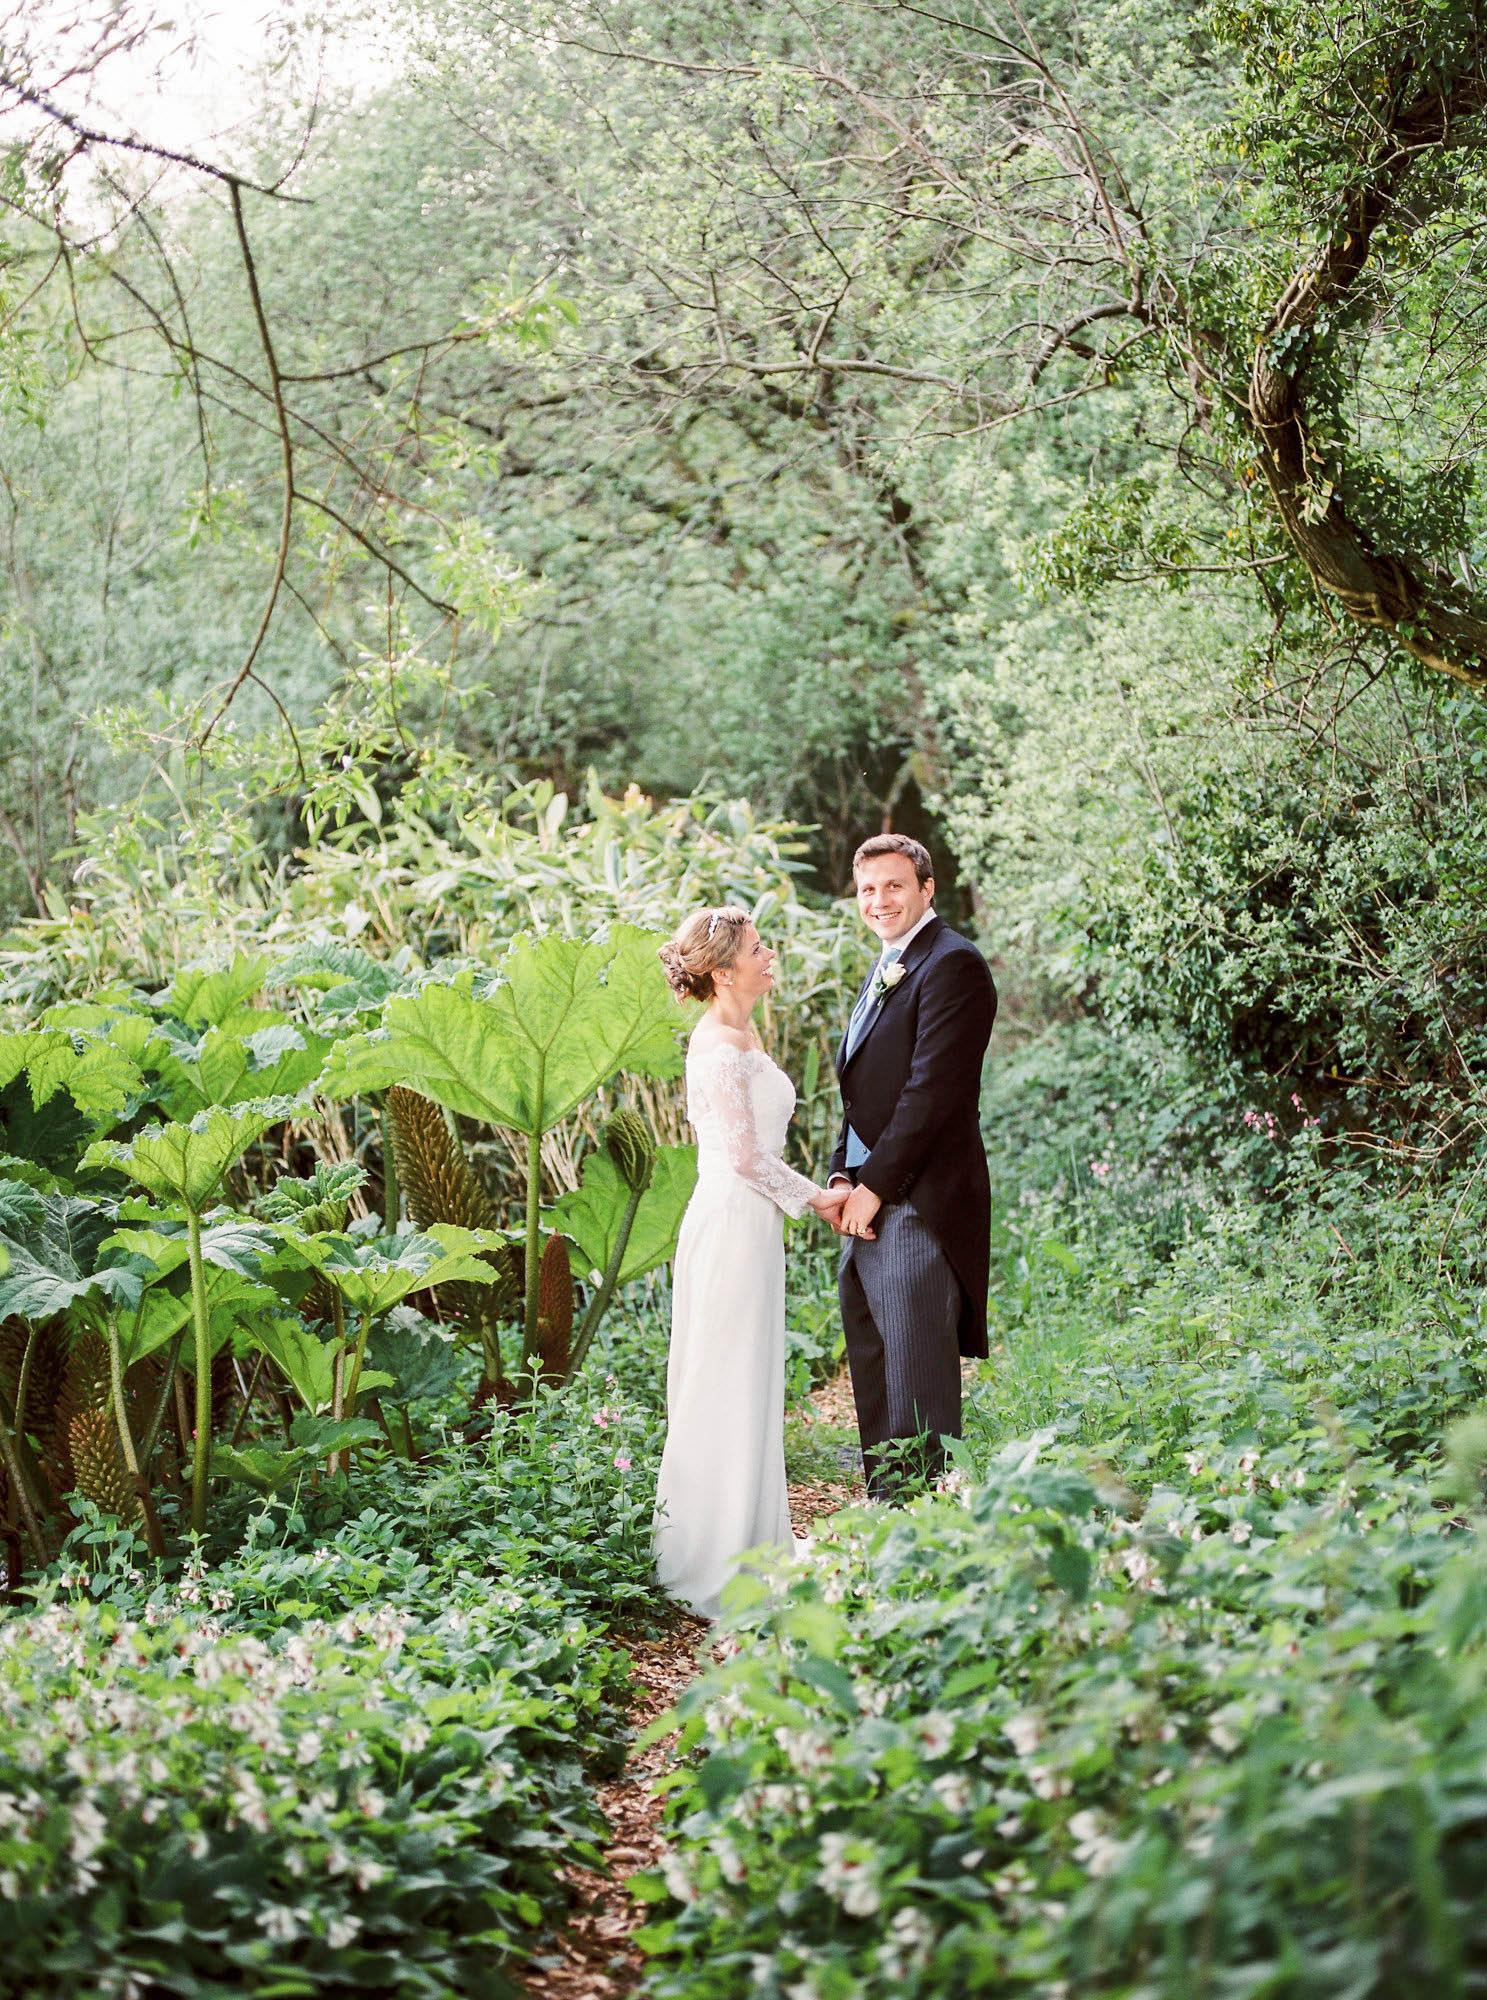 Amy O'Boyle Photography- Destination & UK Fine Art Film Wedding Photographer- English Countryside Wedding-12.jpg